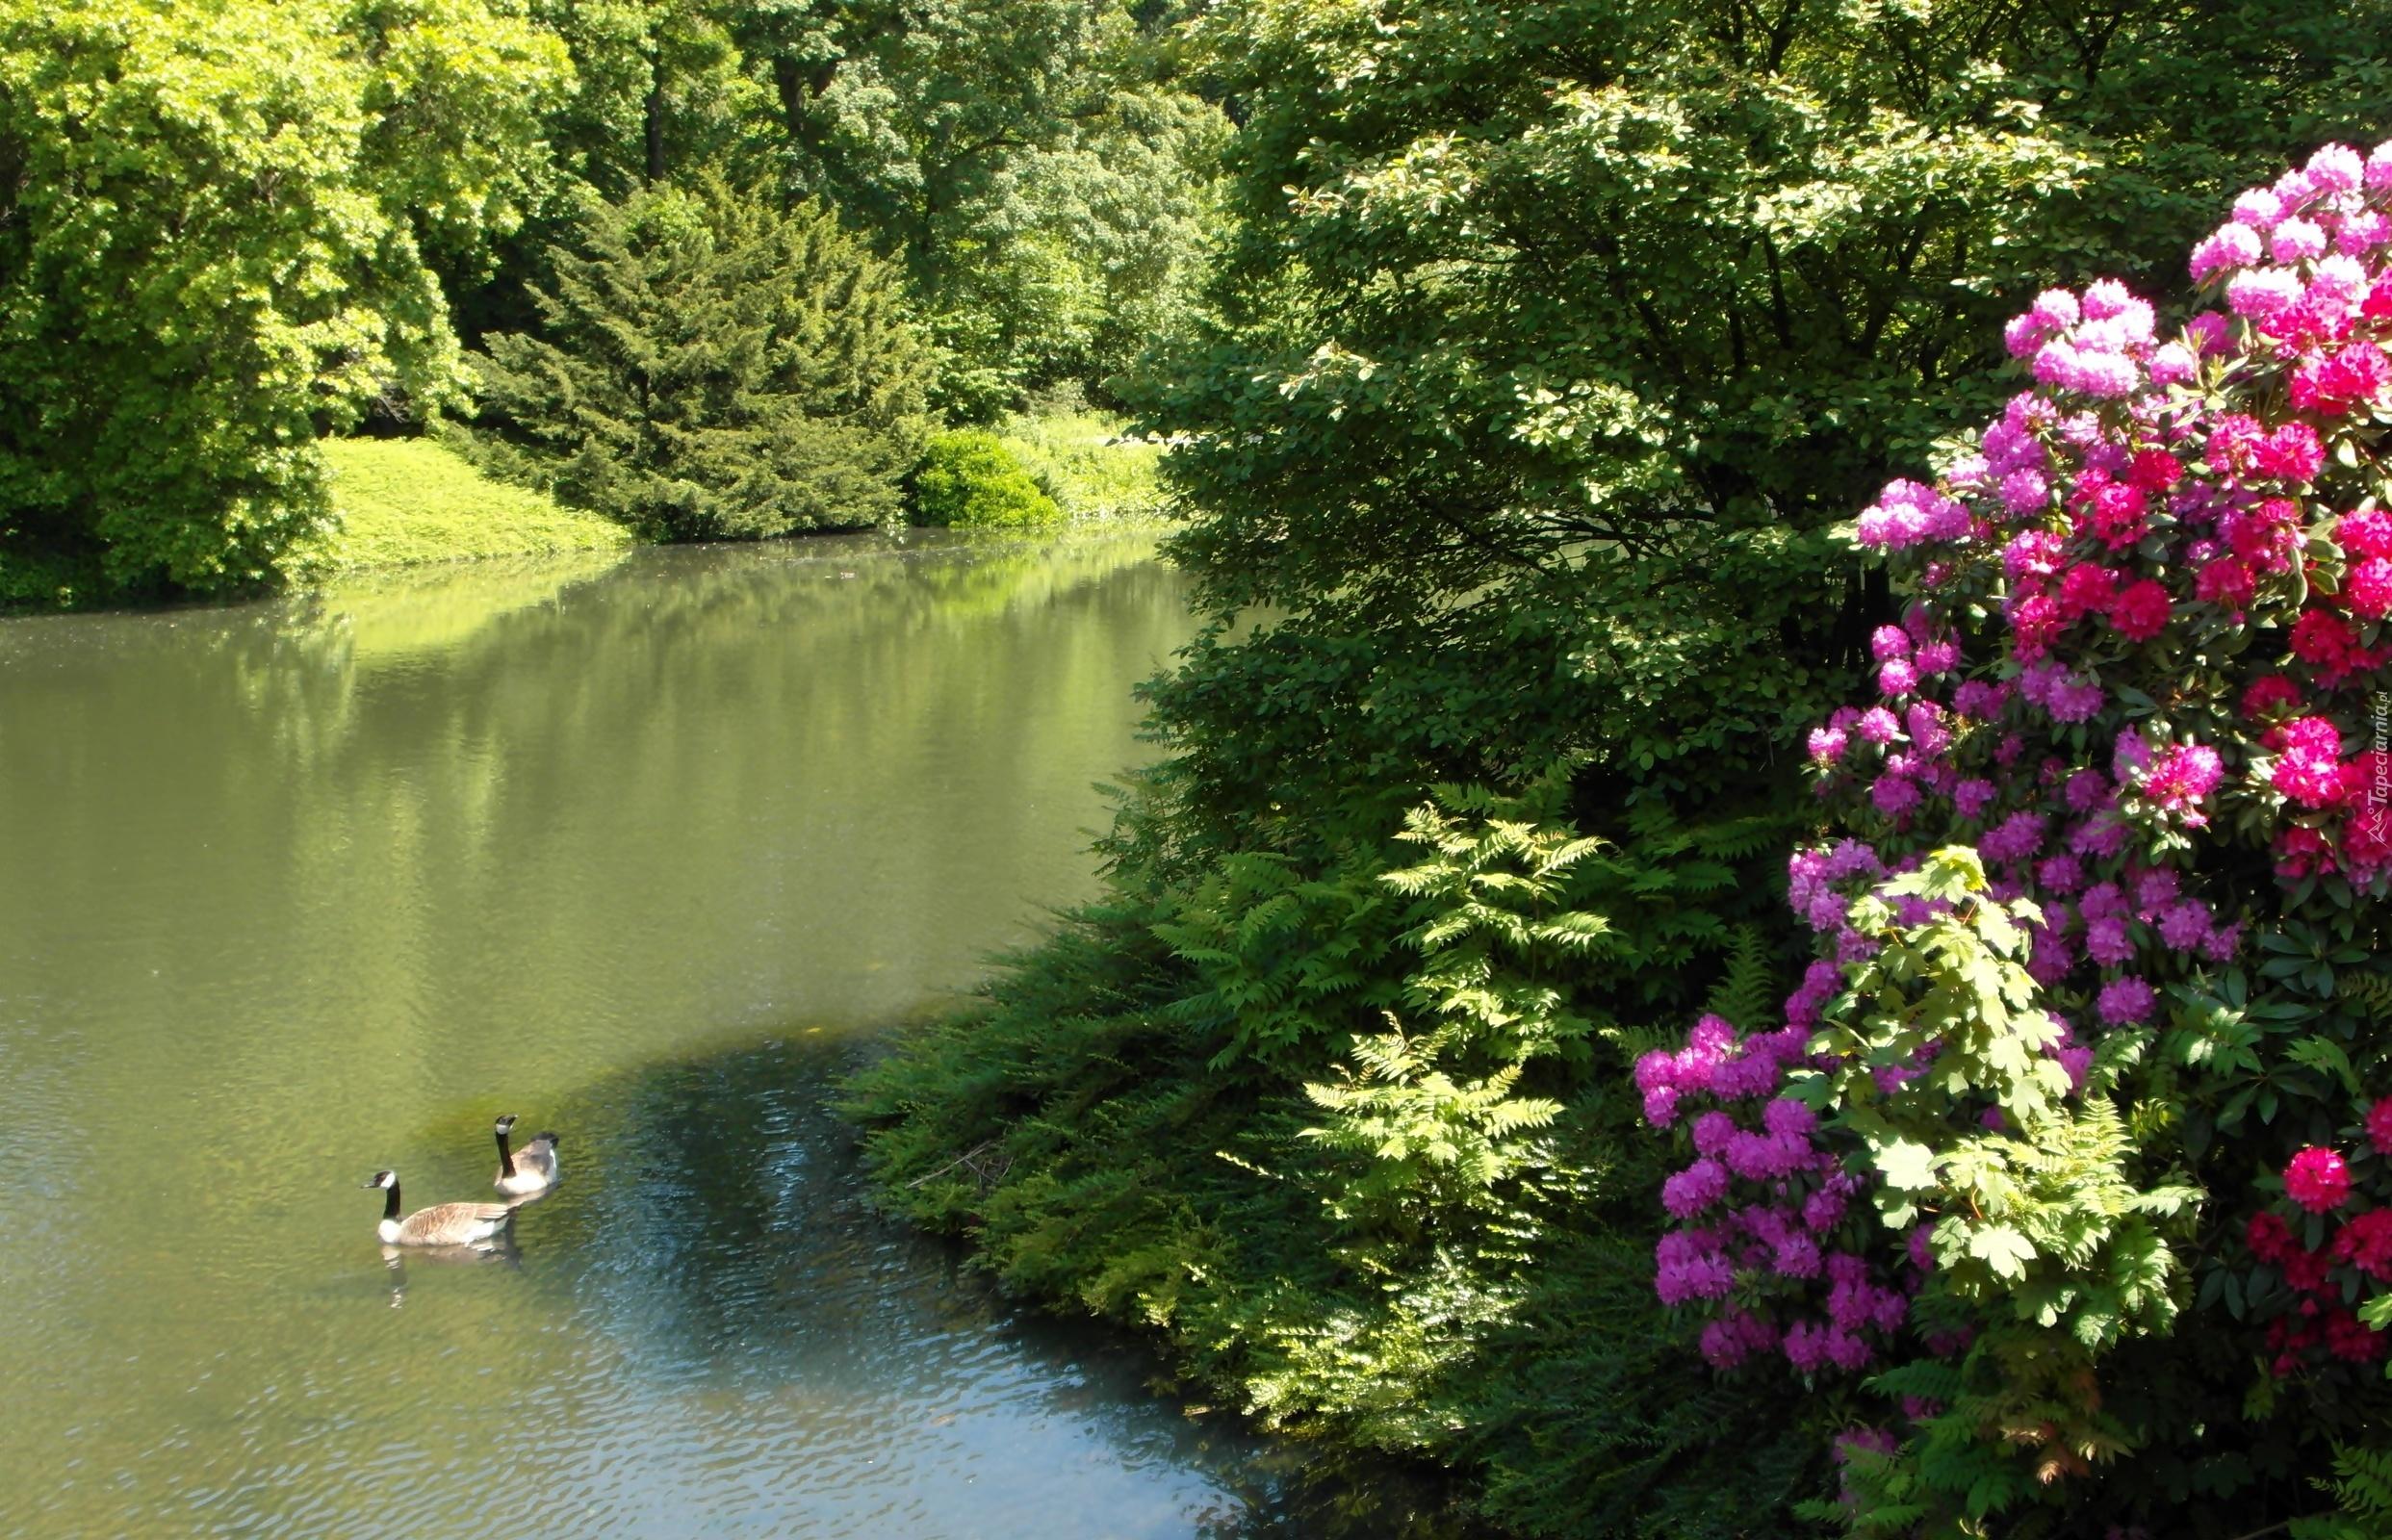 grugapark essen staw kaczki krzewy rododendron niemcy. Black Bedroom Furniture Sets. Home Design Ideas